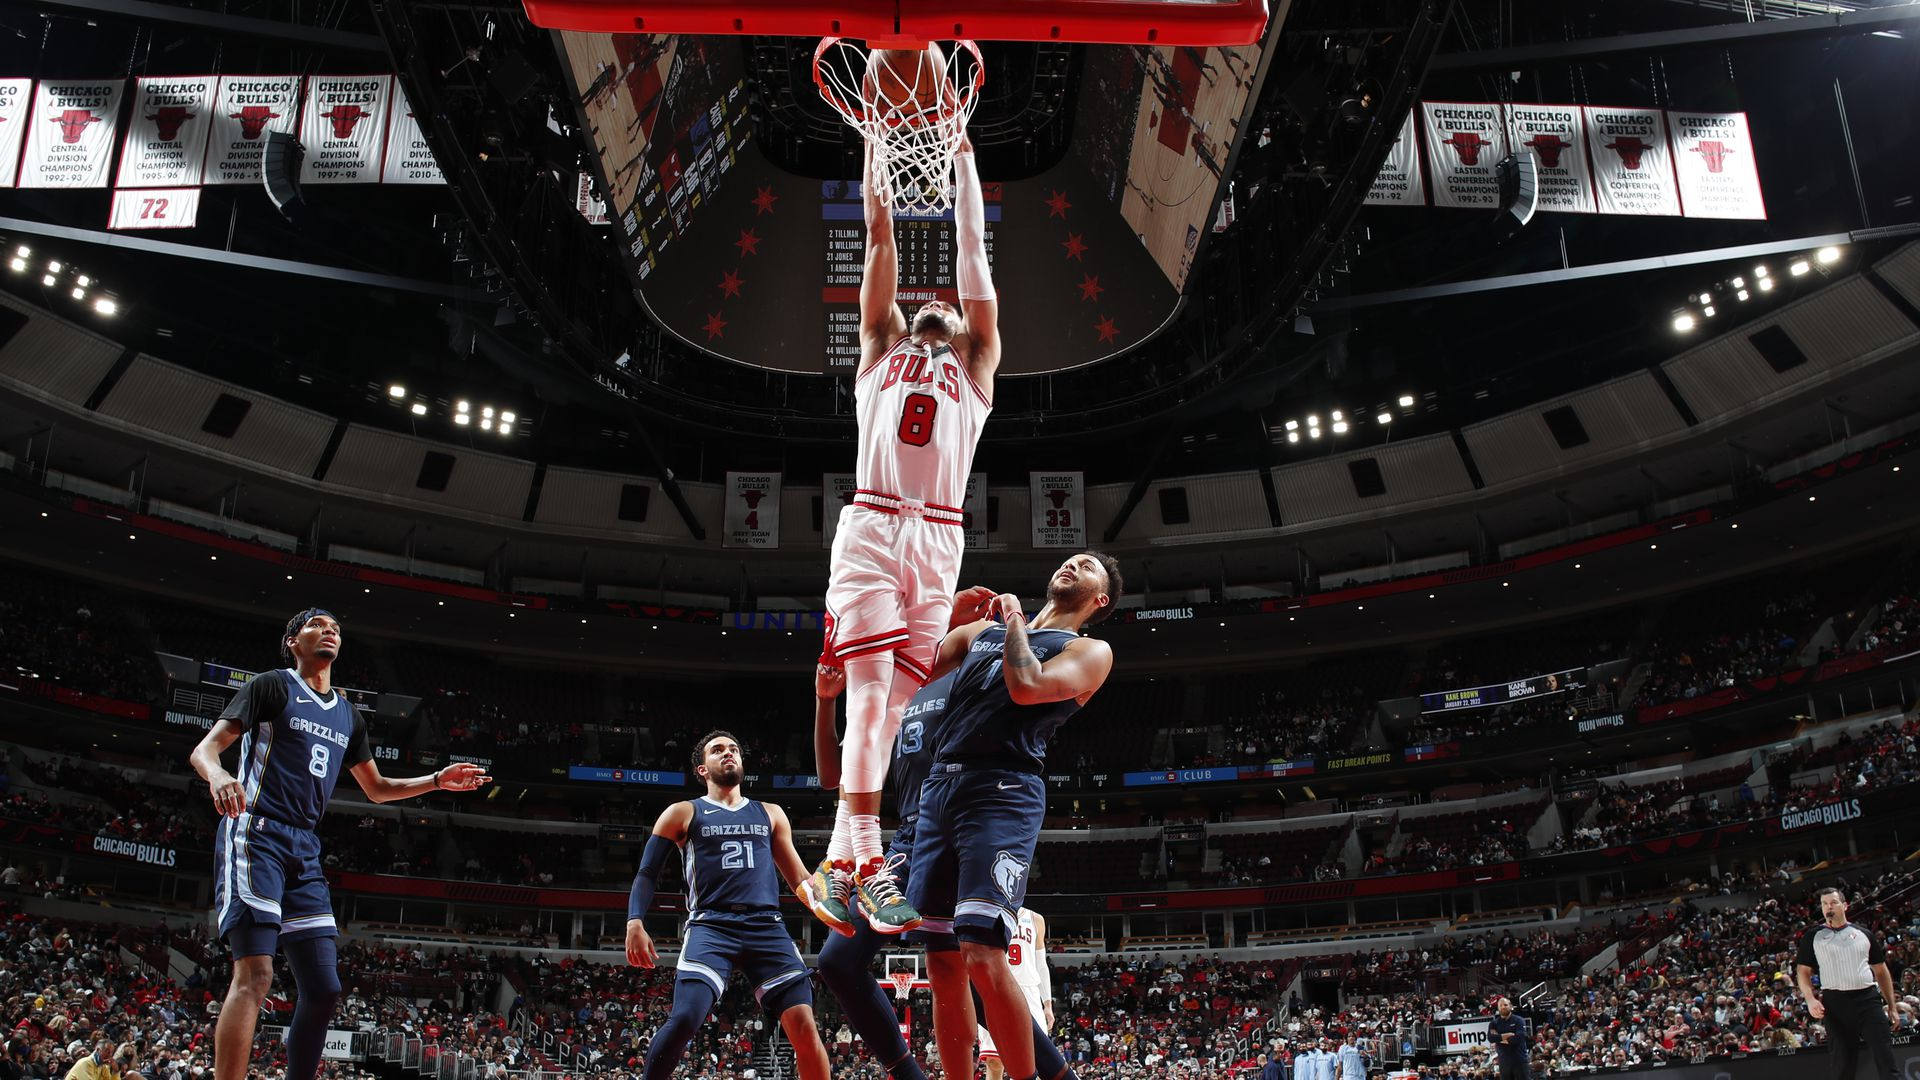 Zach Lavine dunks a basketball.